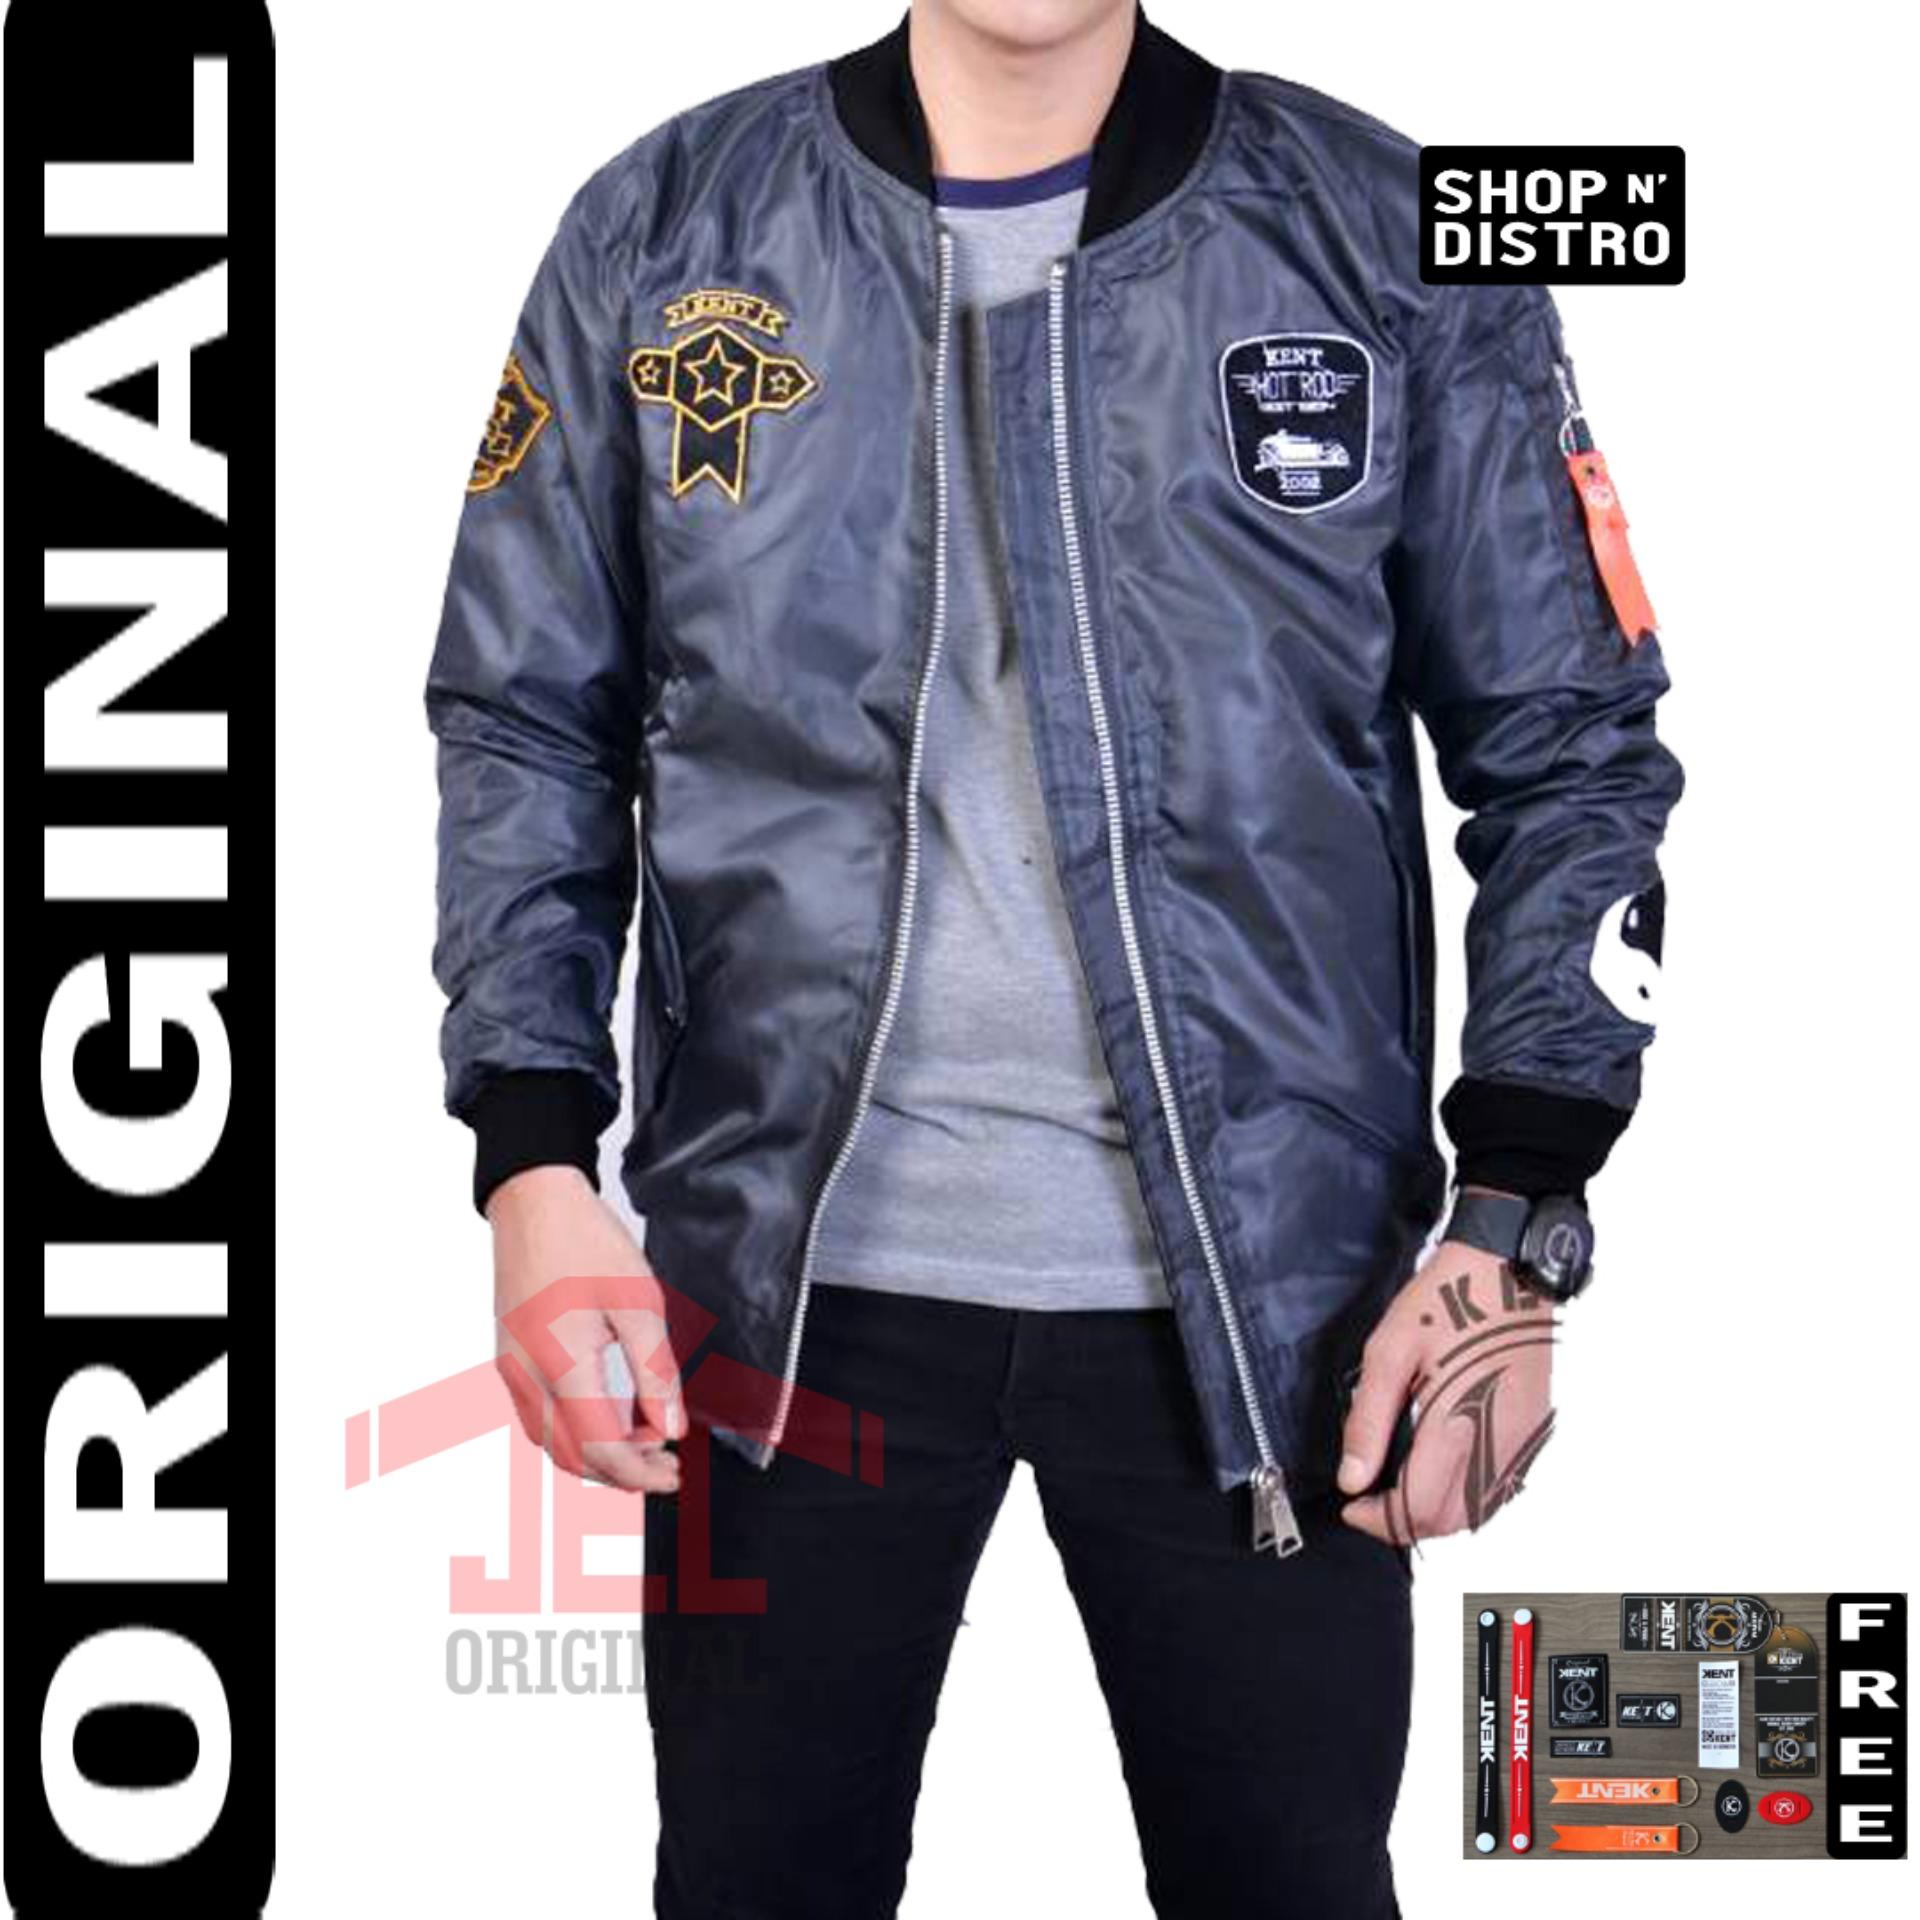 PILOT - Jaket Bomber Original Police Full Premium Waterproof Quality Distro - Jaket Tebal - Jacket